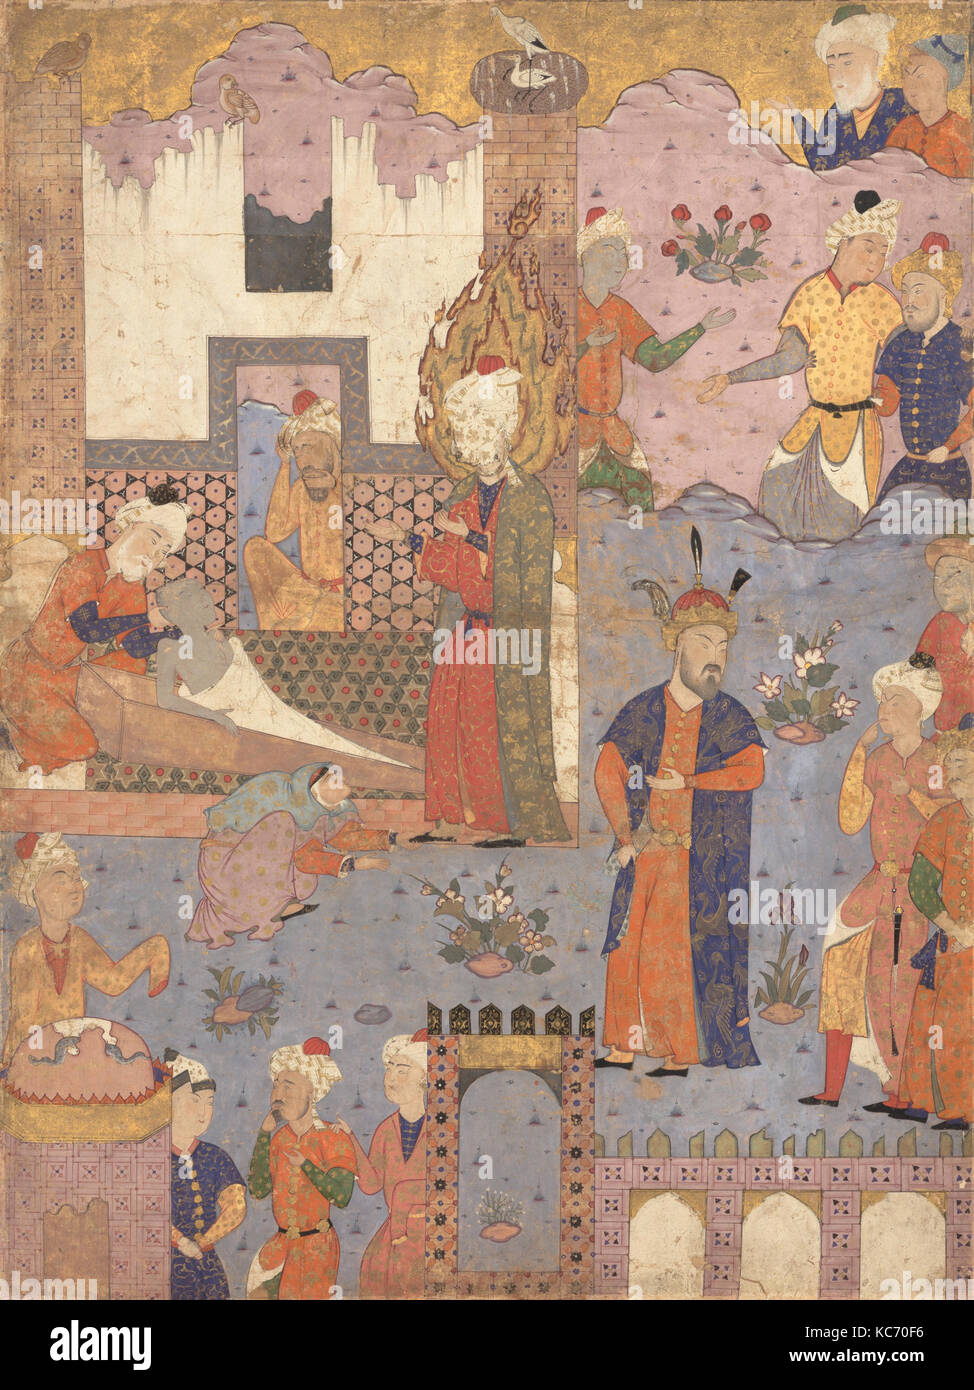 'Muhammad Revives the Sick Boy', Folio from a Falnama (Book of Omens) of Ja'far al-Sadiq, 1550s - Stock Image